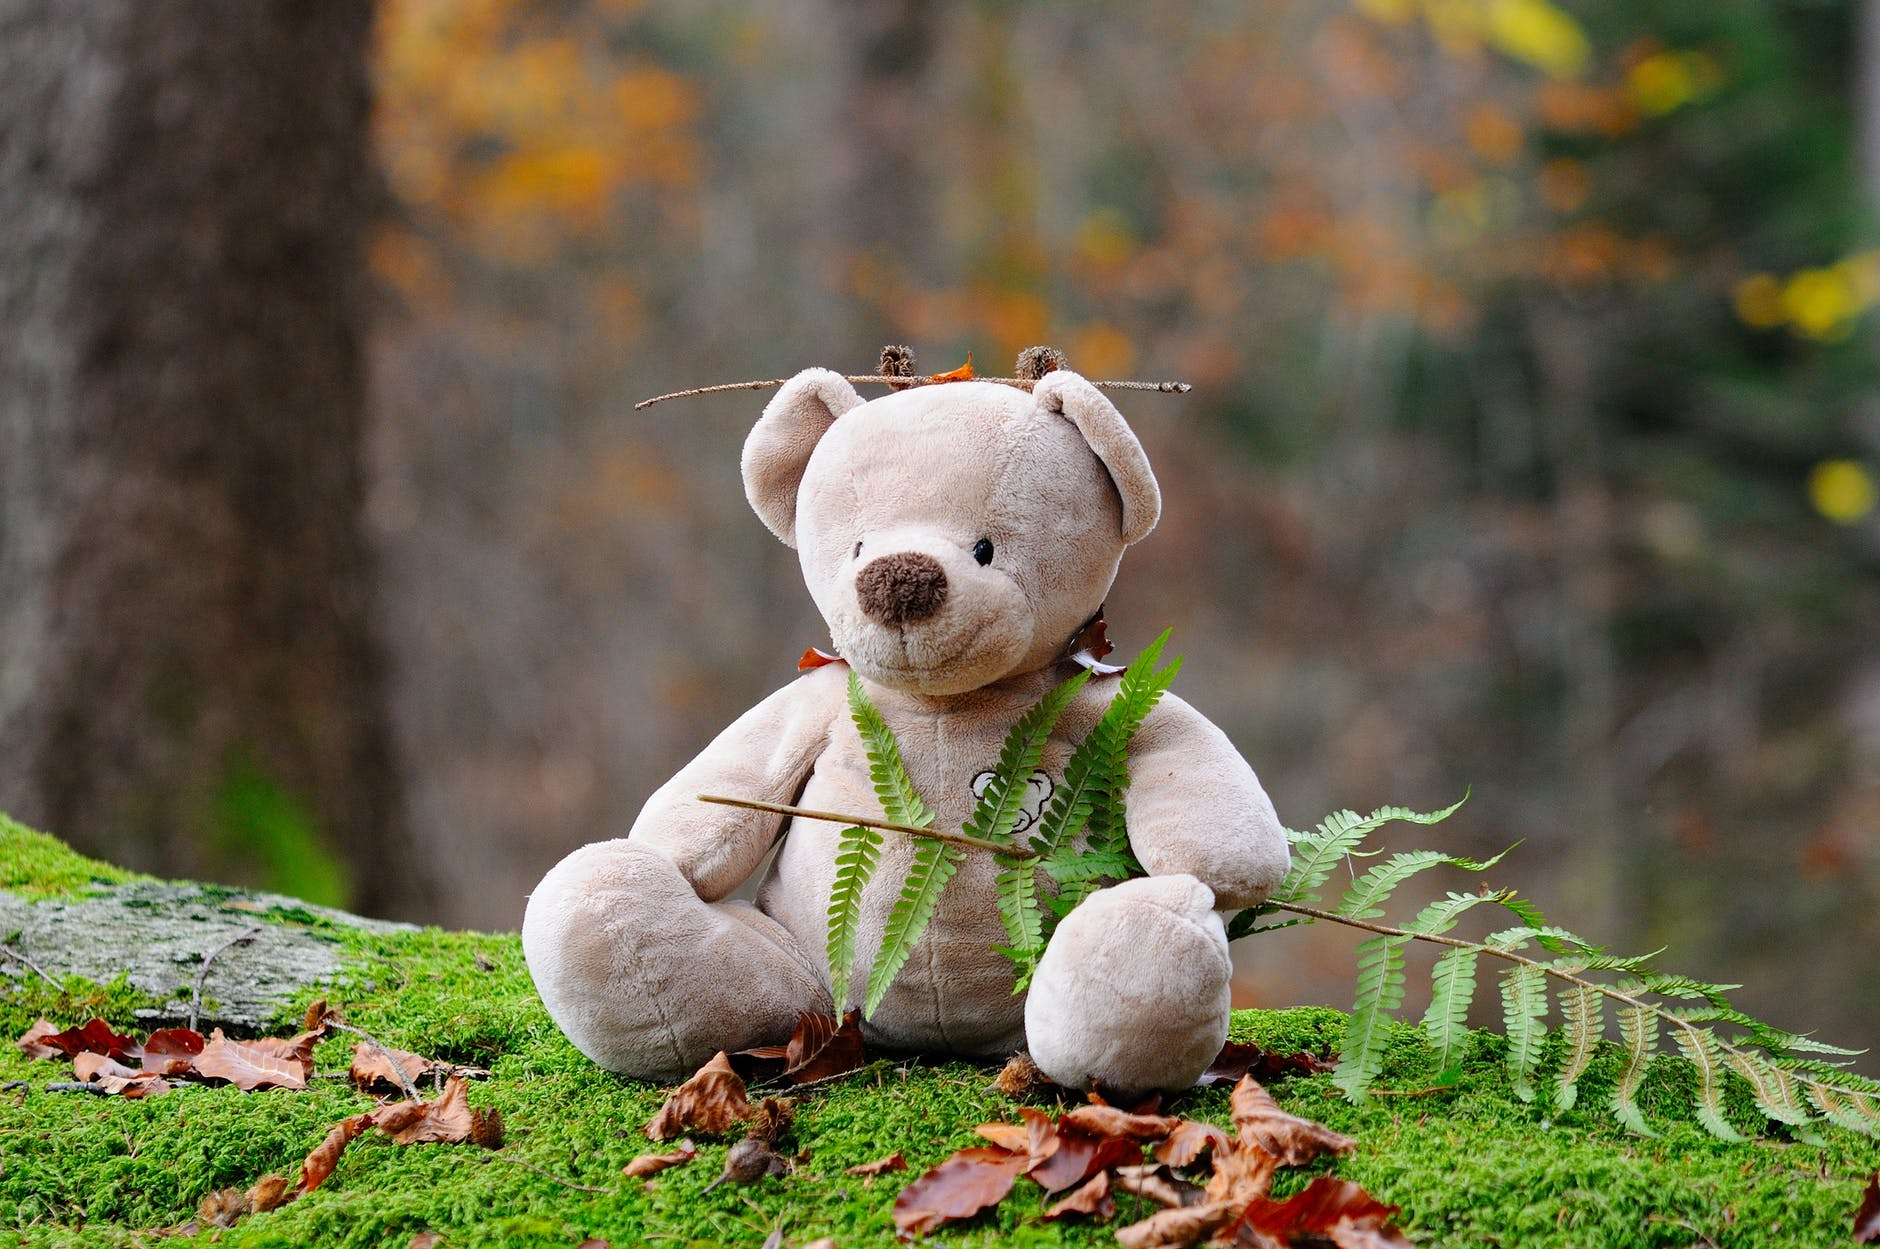 gray bear plush toy on green grass during daytime